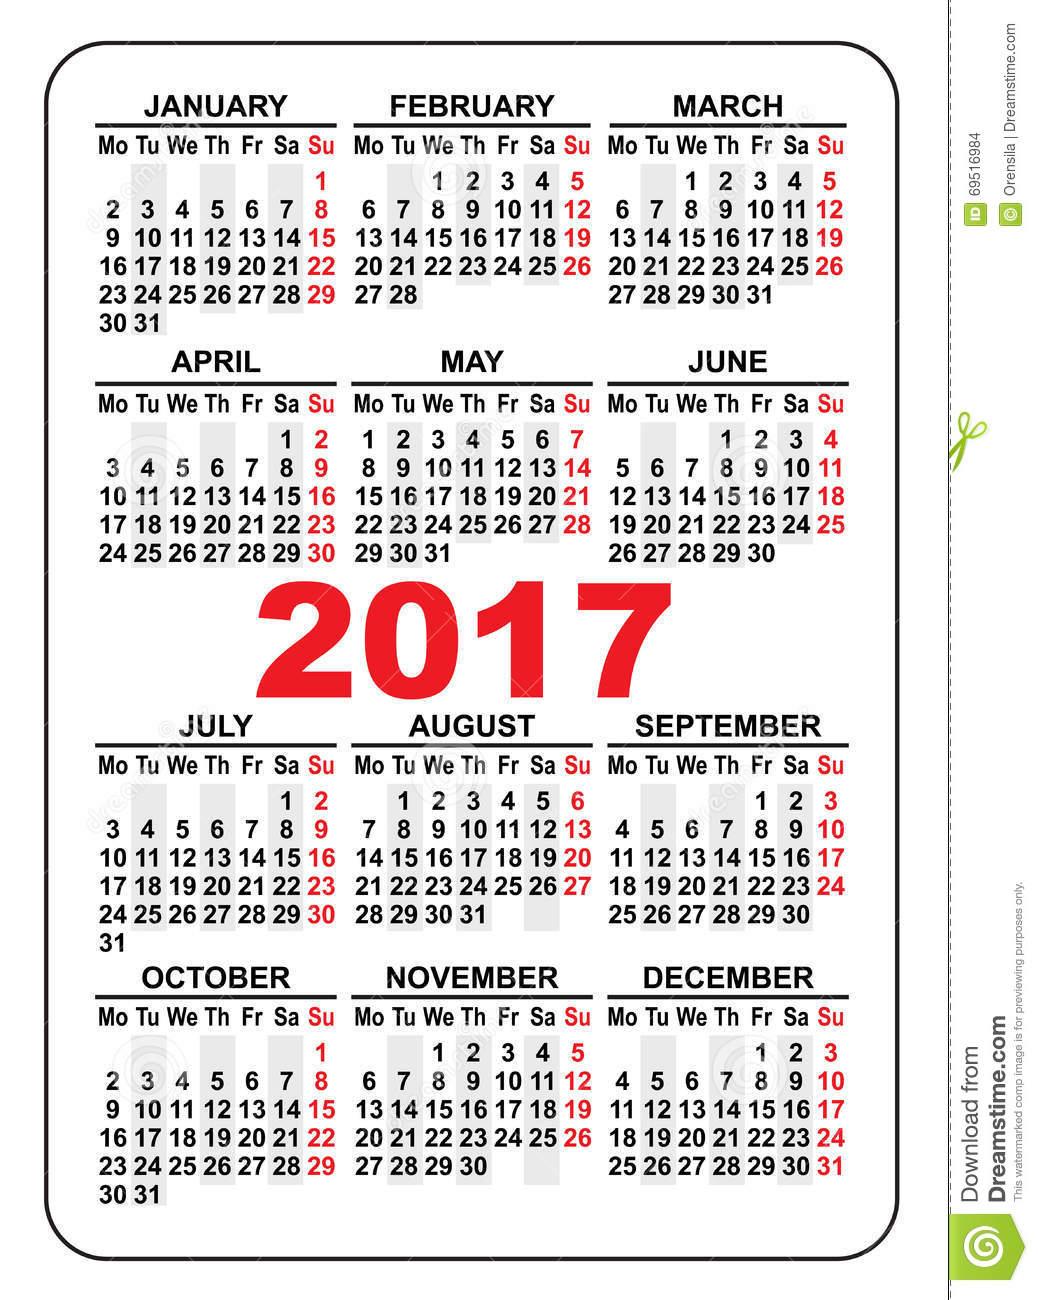 2017 Pocket Calendar | Templates Free Printable for Pocket Size Calendar Printable